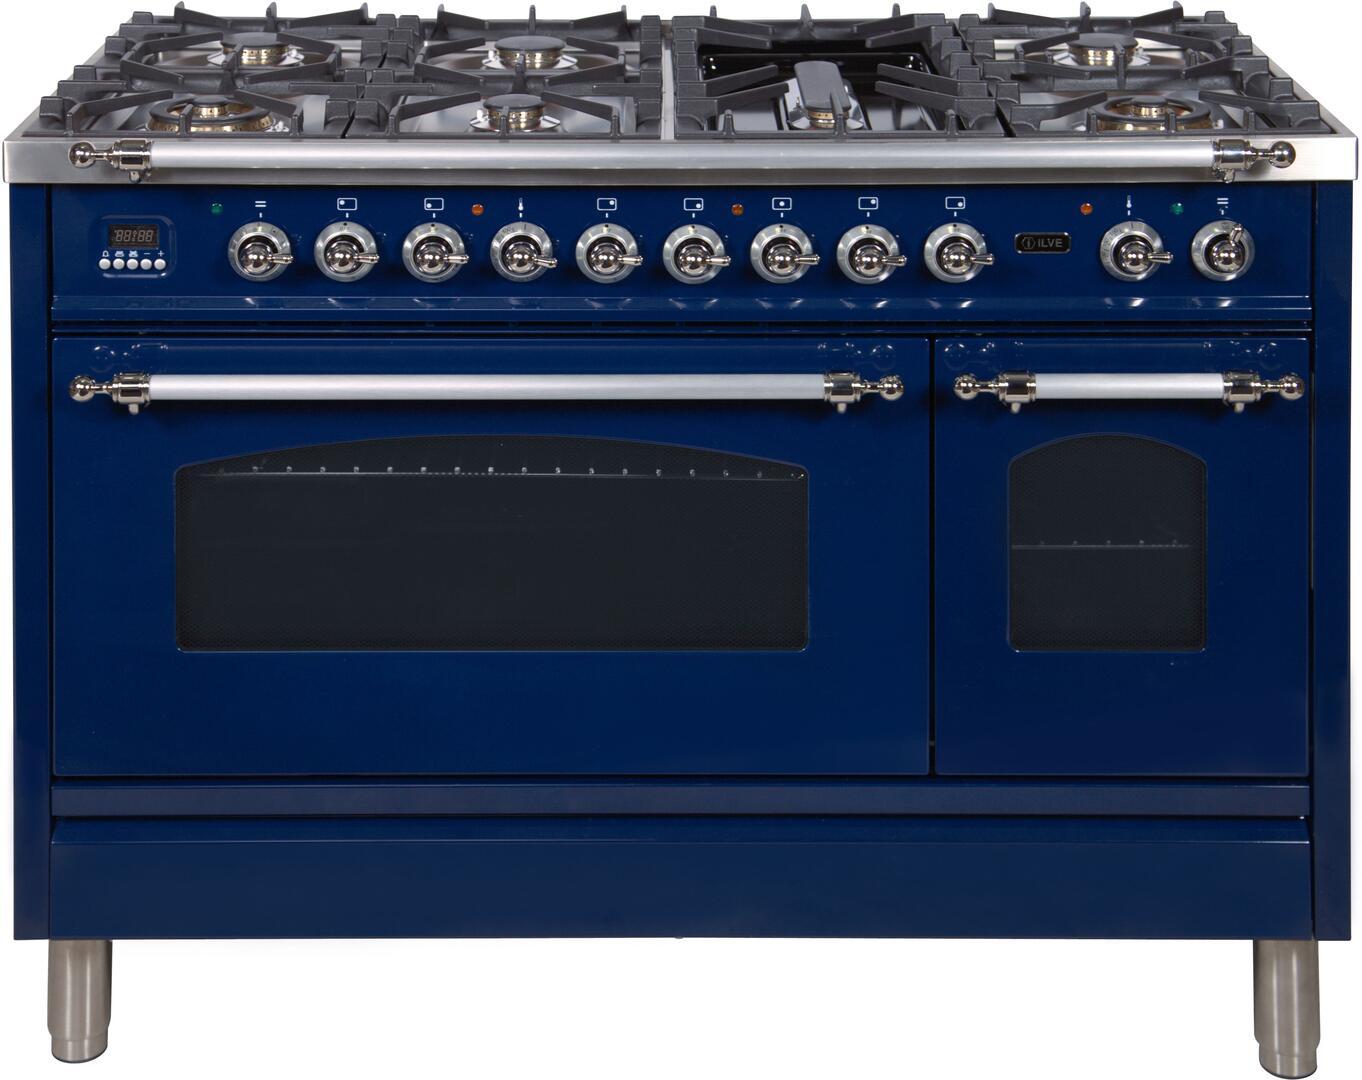 Ilve Nostalgie UPN120FDMPBLX Freestanding Dual Fuel Range Blue, UPN120FDMPBLX Dual Fuel Range